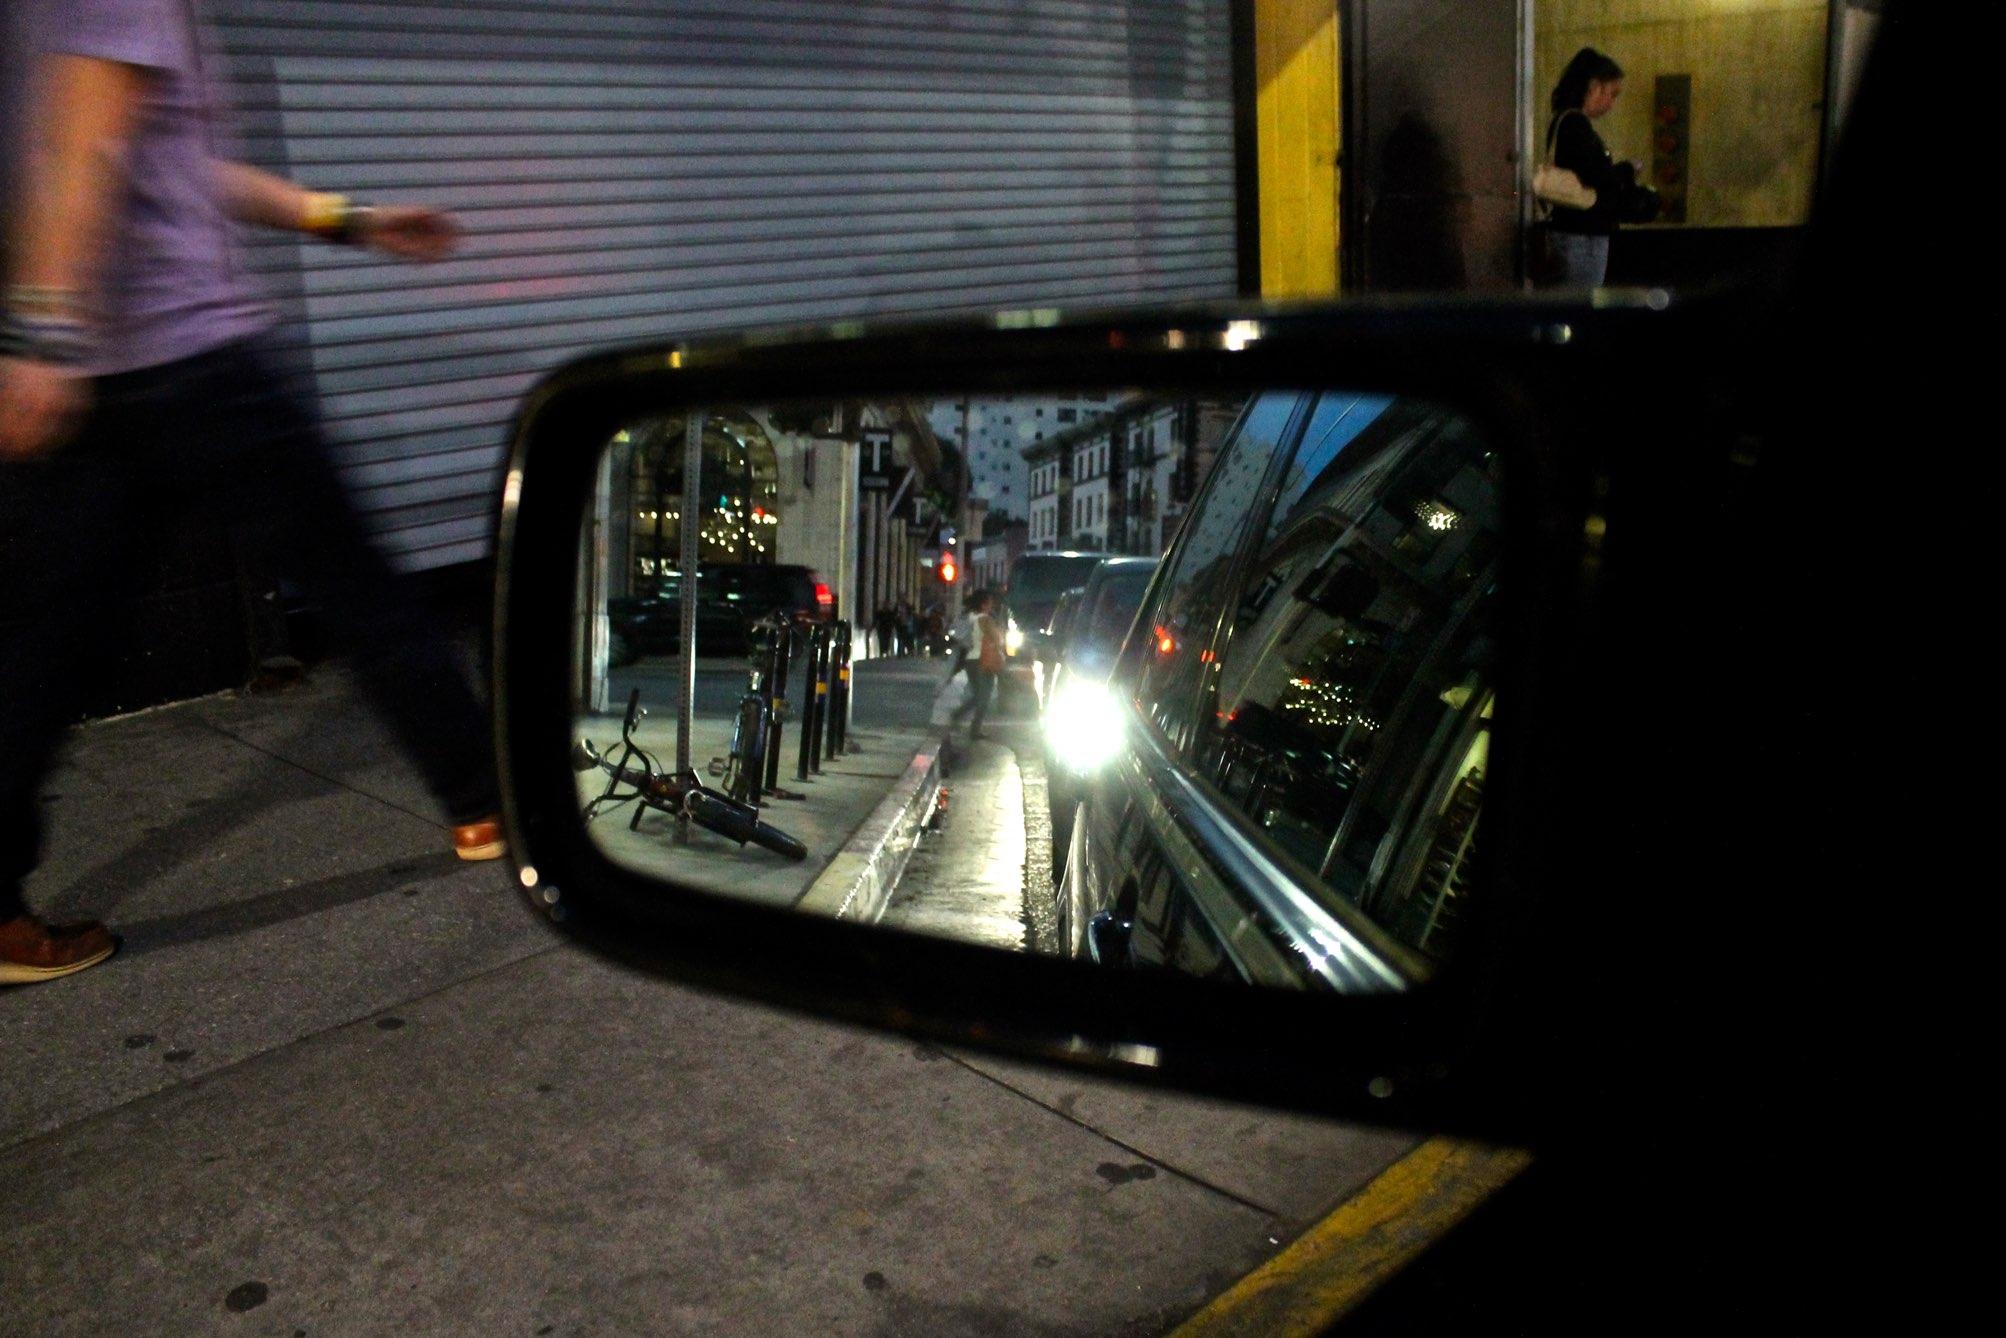 Downtown Los Angeles traffic via The Caffeinated Closet